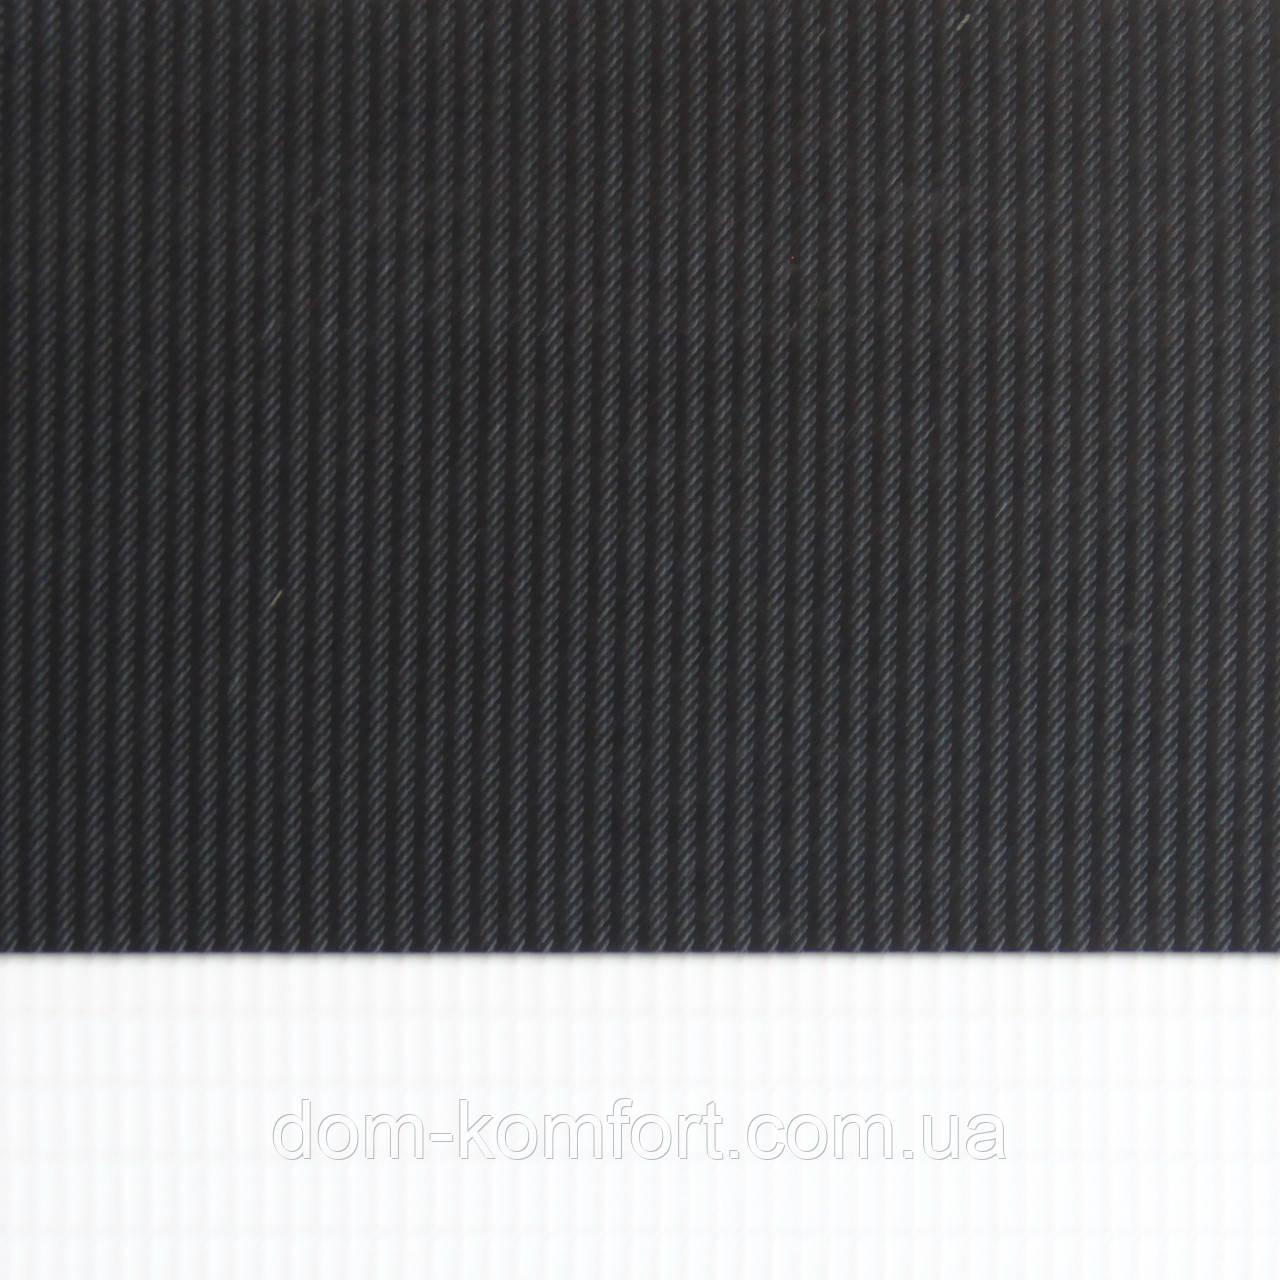 Рулонные шторы День Ночь Ткань Панама Z-055 Чёрный